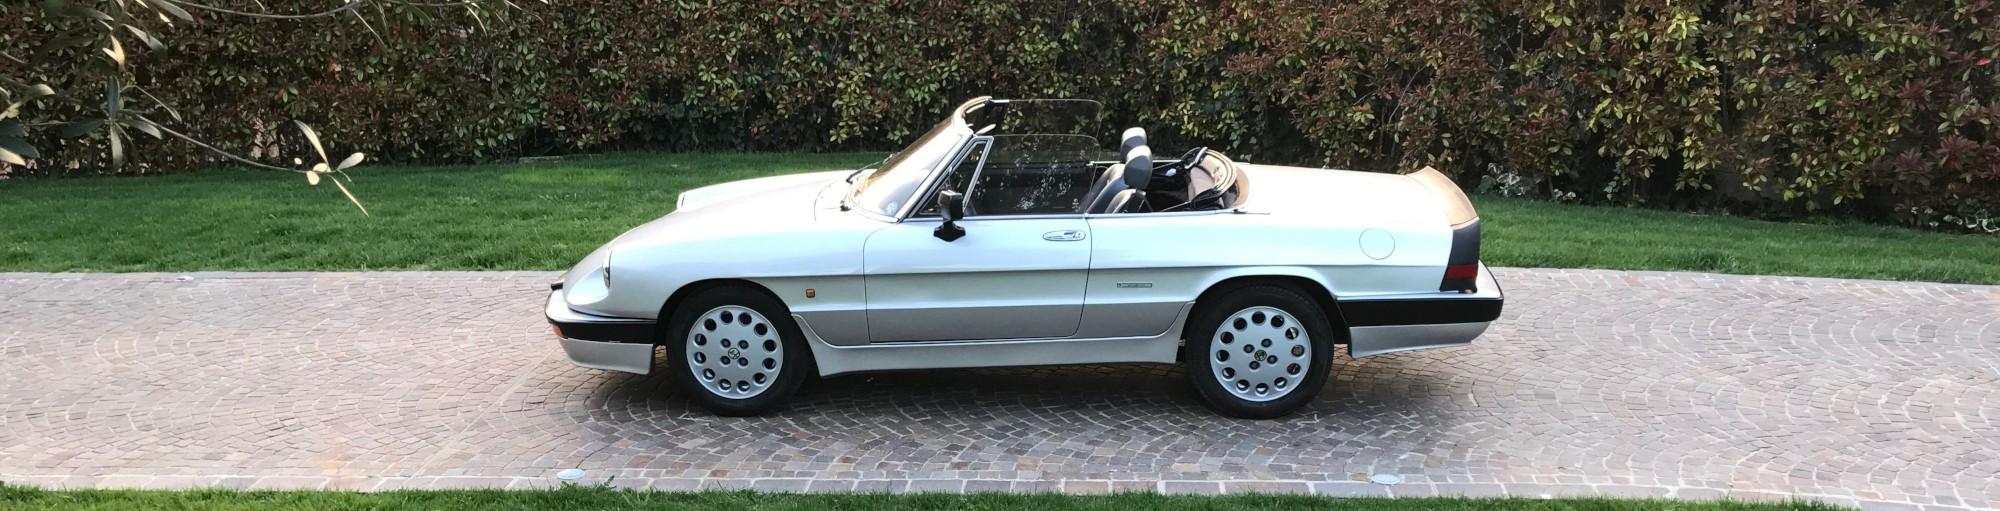 Alfa Romeo Spider Quadrifoglio Verde in vendita - Passione Classica